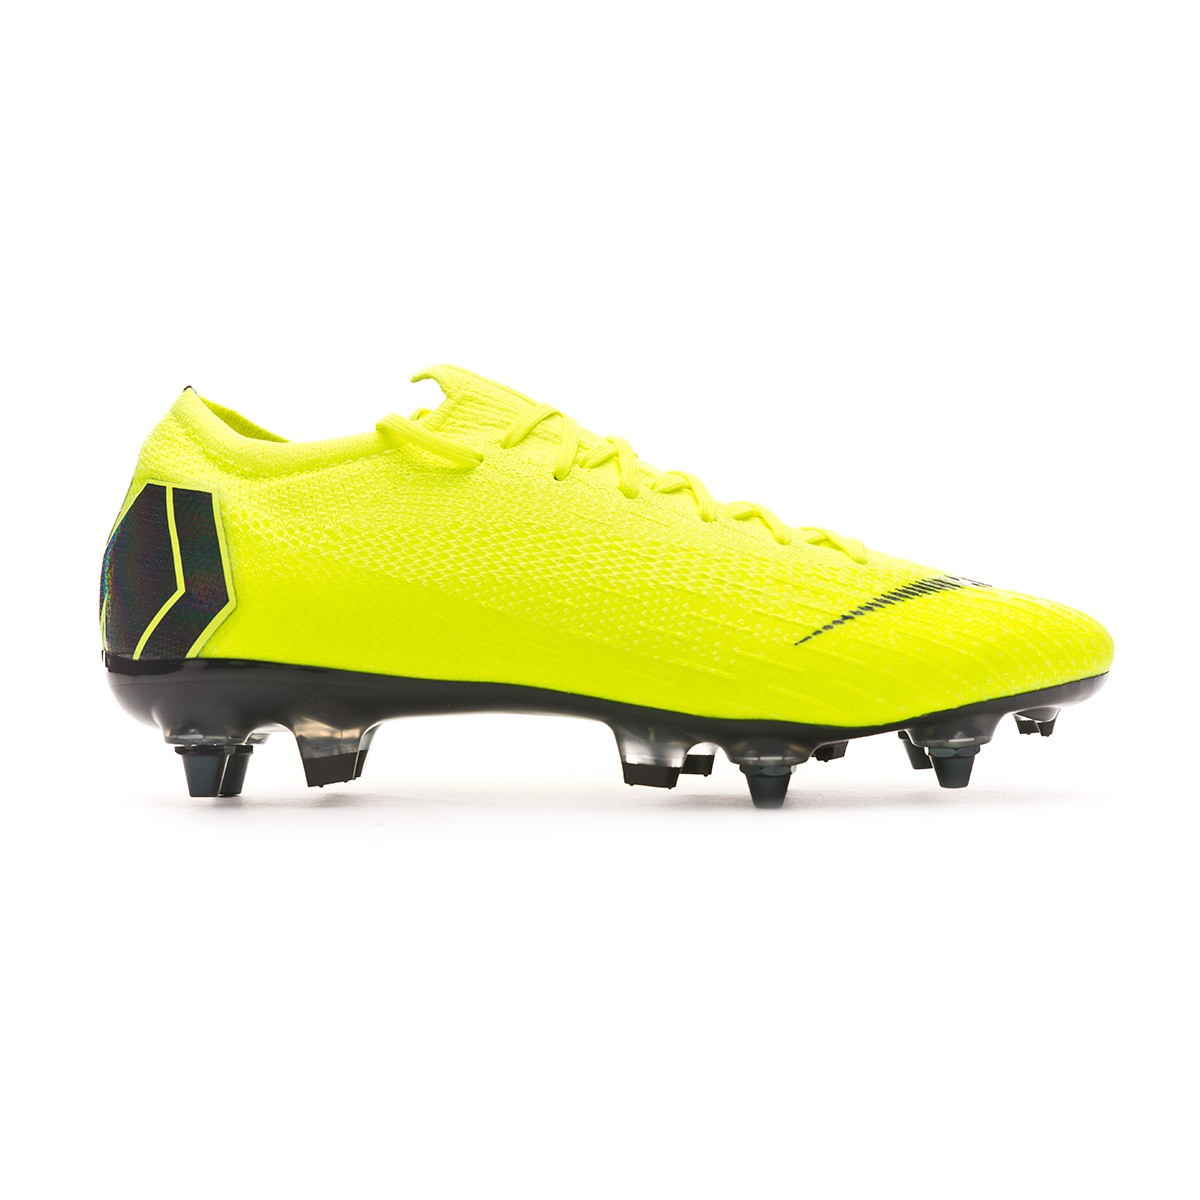 Hula hoop agua Botánica  Football Boots Nike Mercurial Vapor XII Elite SG-Pro Anti-Clog Volt-Black -  Football store Fútbol Emotion